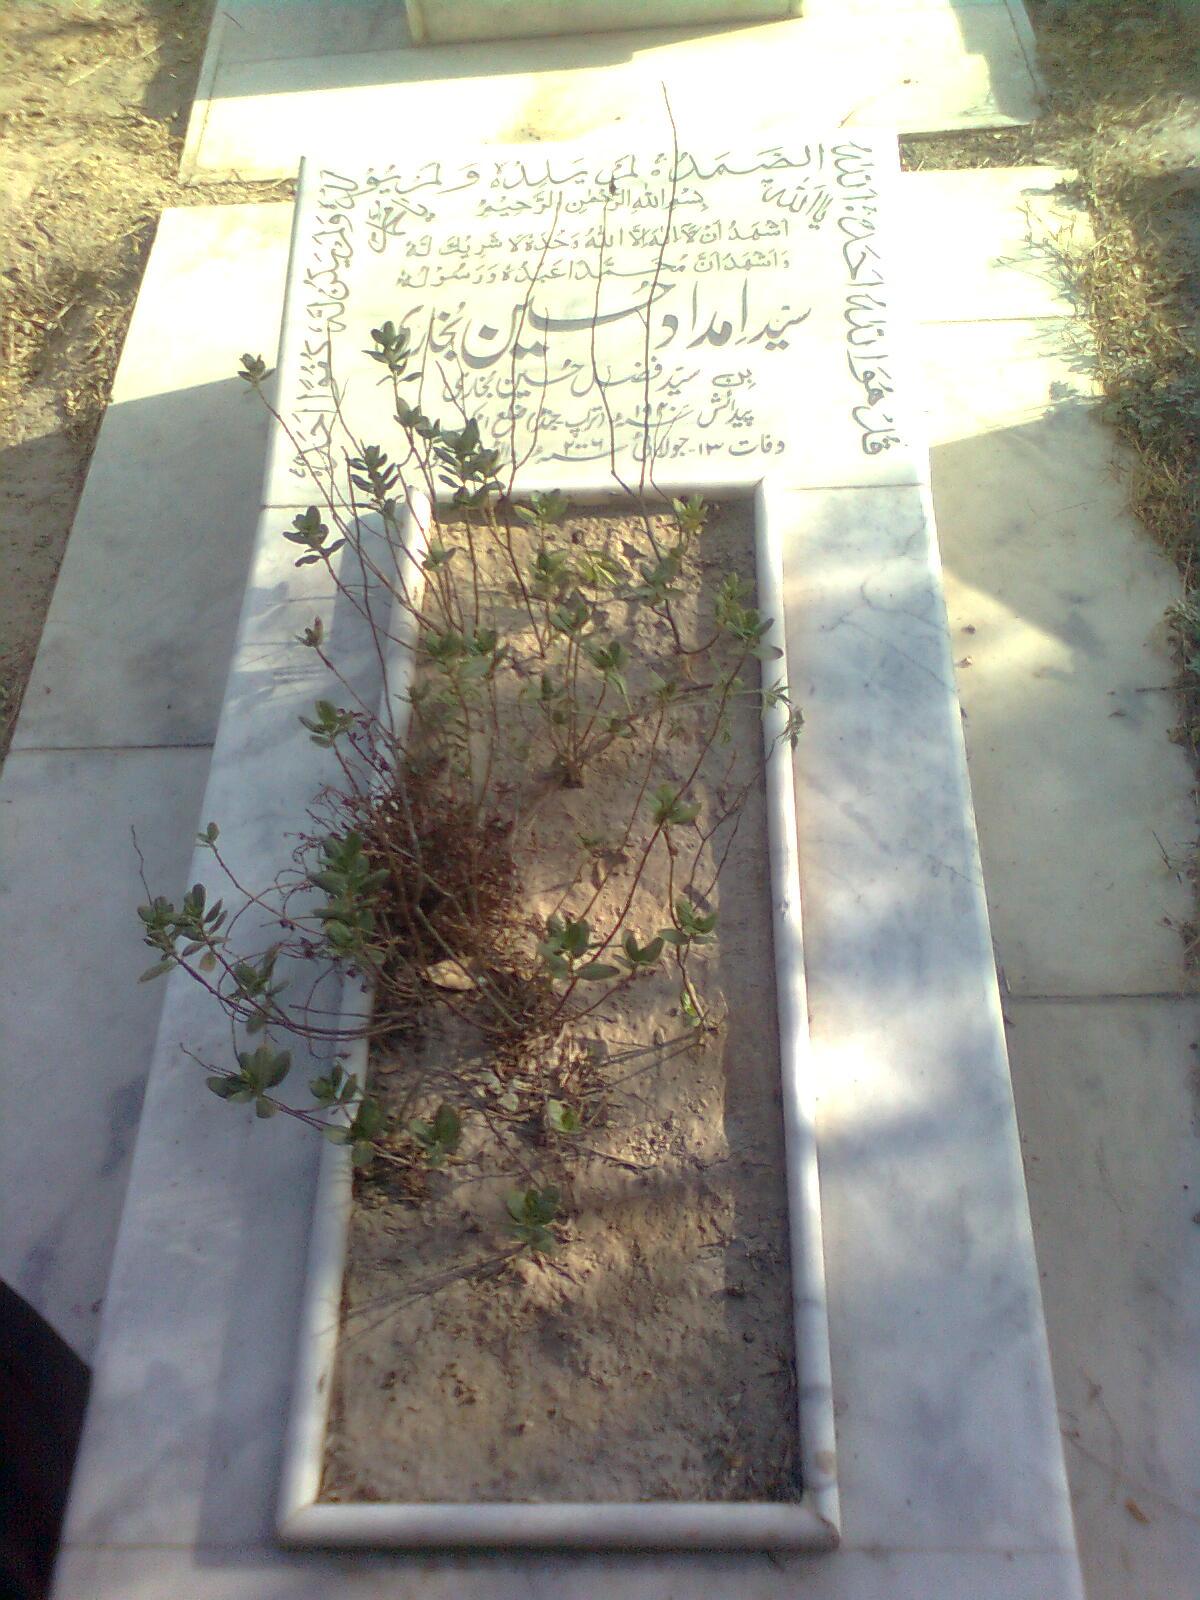 Syed Imdad Hussain Bukhari 1940-13th July 2006